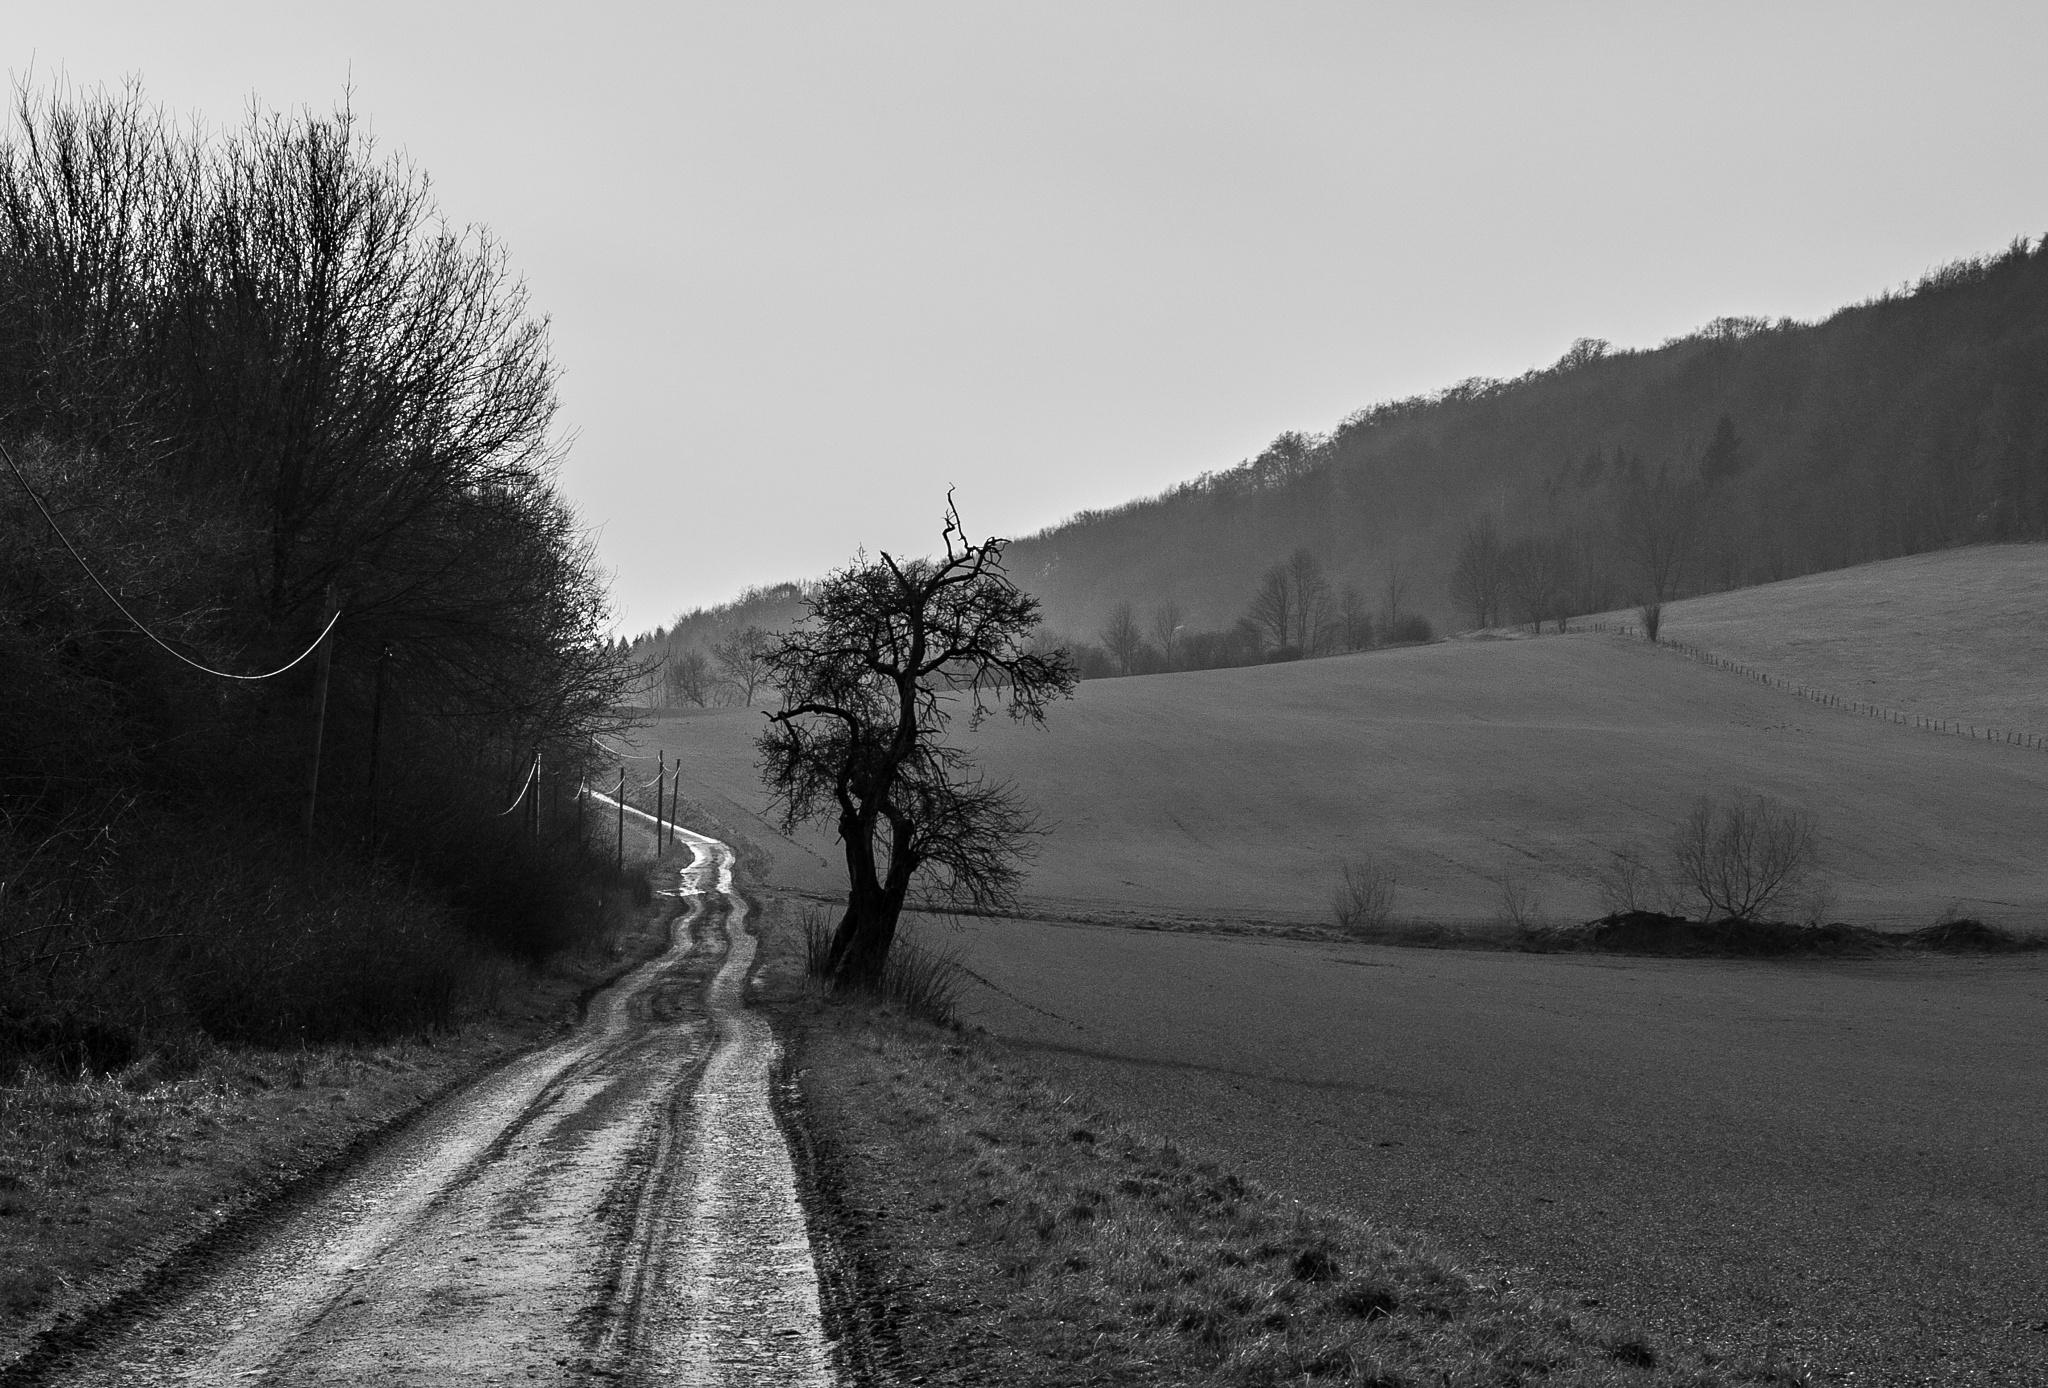 Güntgenburg by uwe.kiok